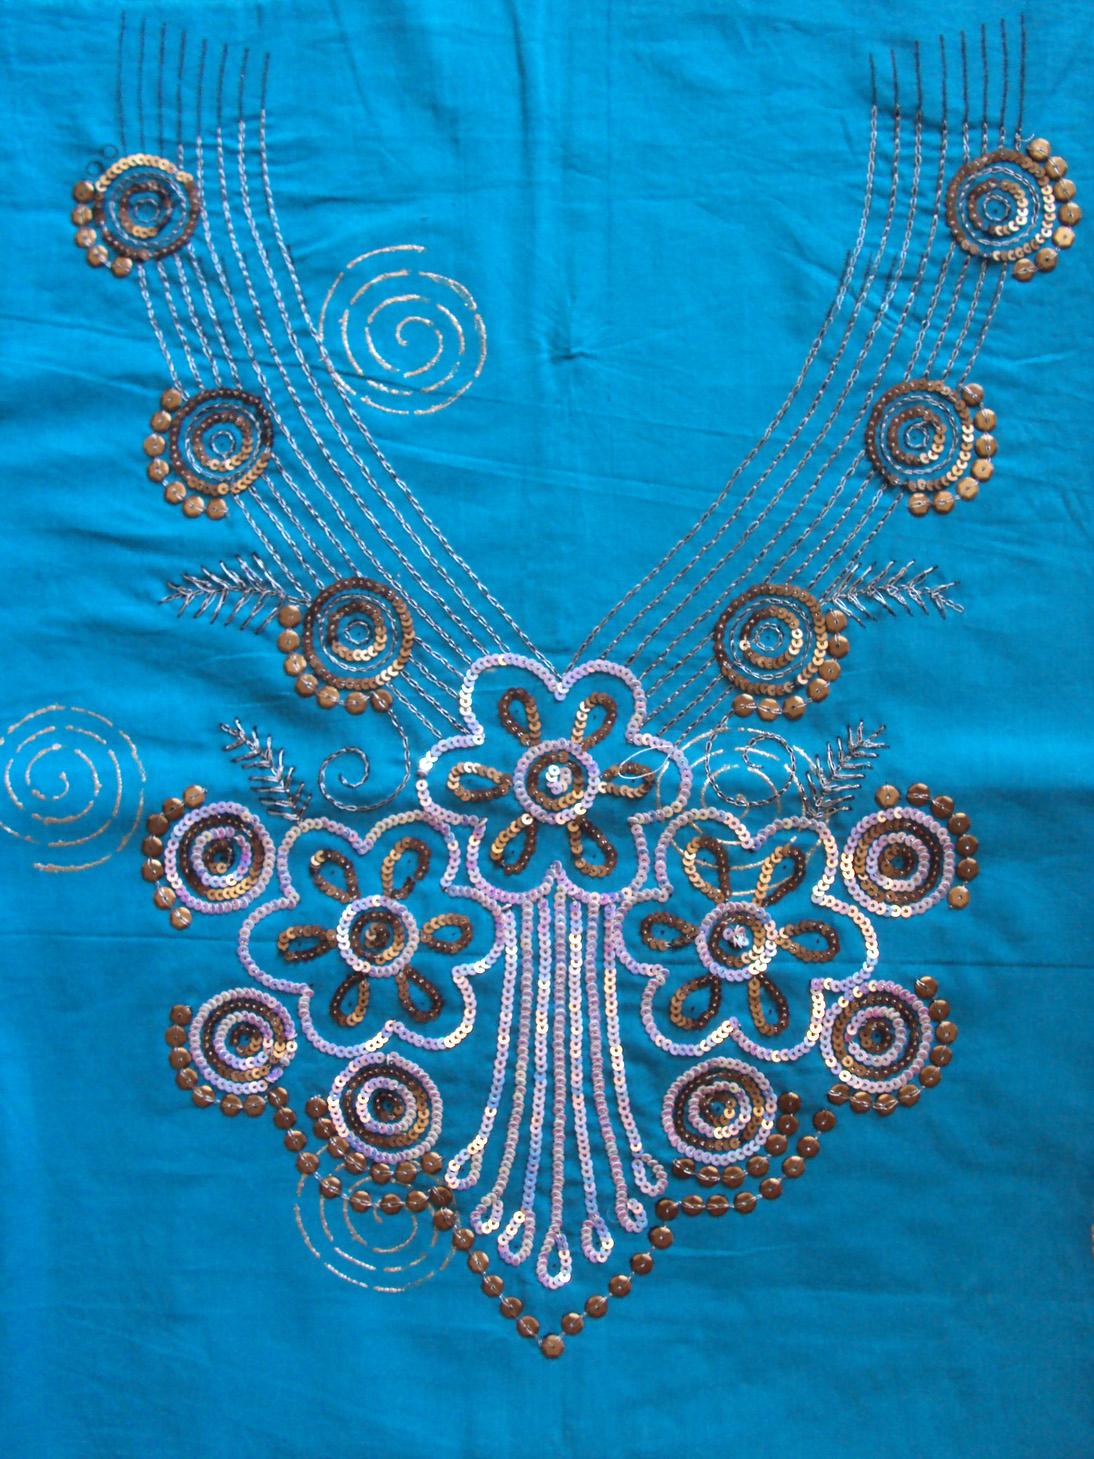 Zari embroidery machine makaroka